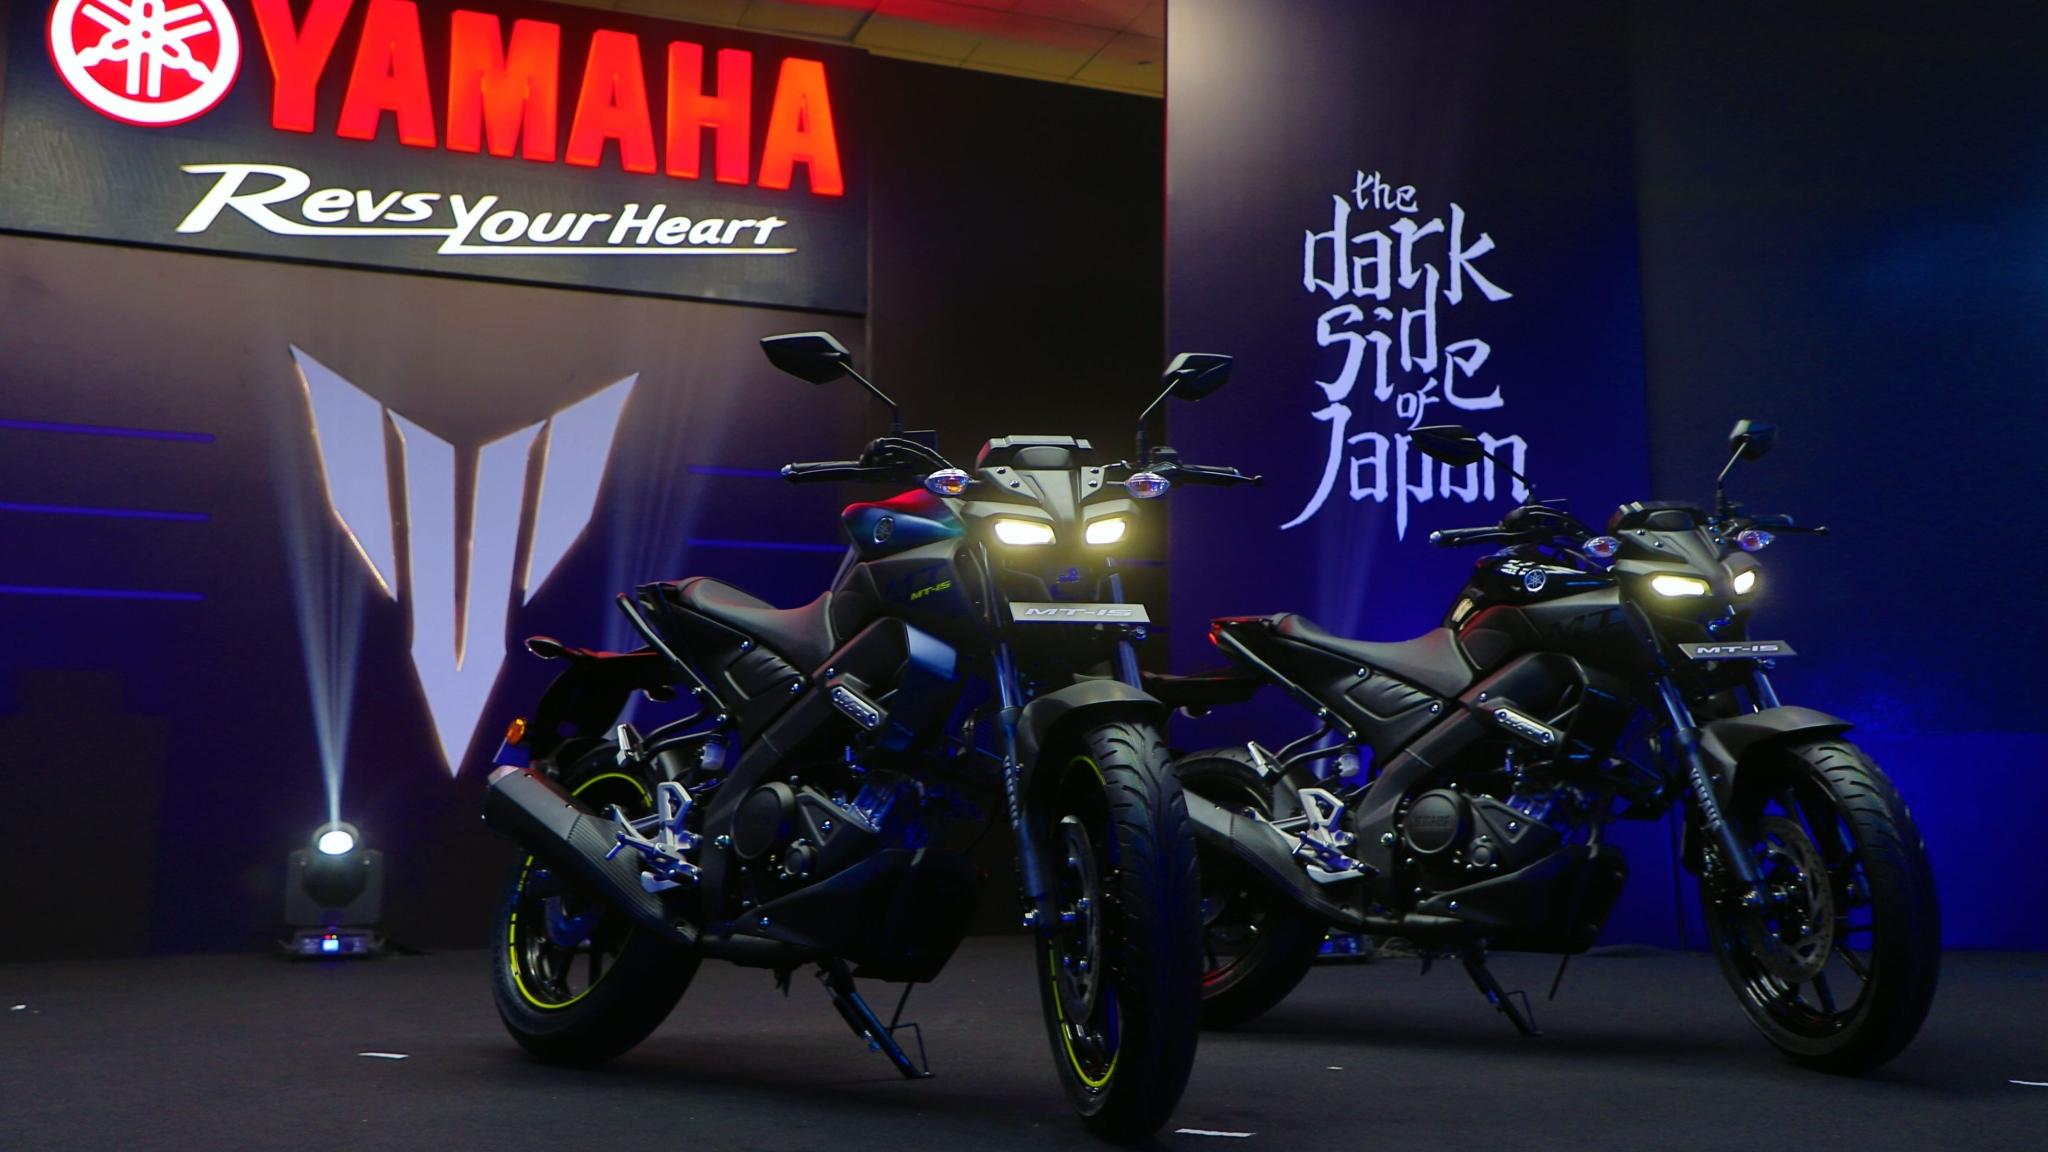 Yamaha MT-15 Naked 150cc Sports Bike Takes on Commuter Segment